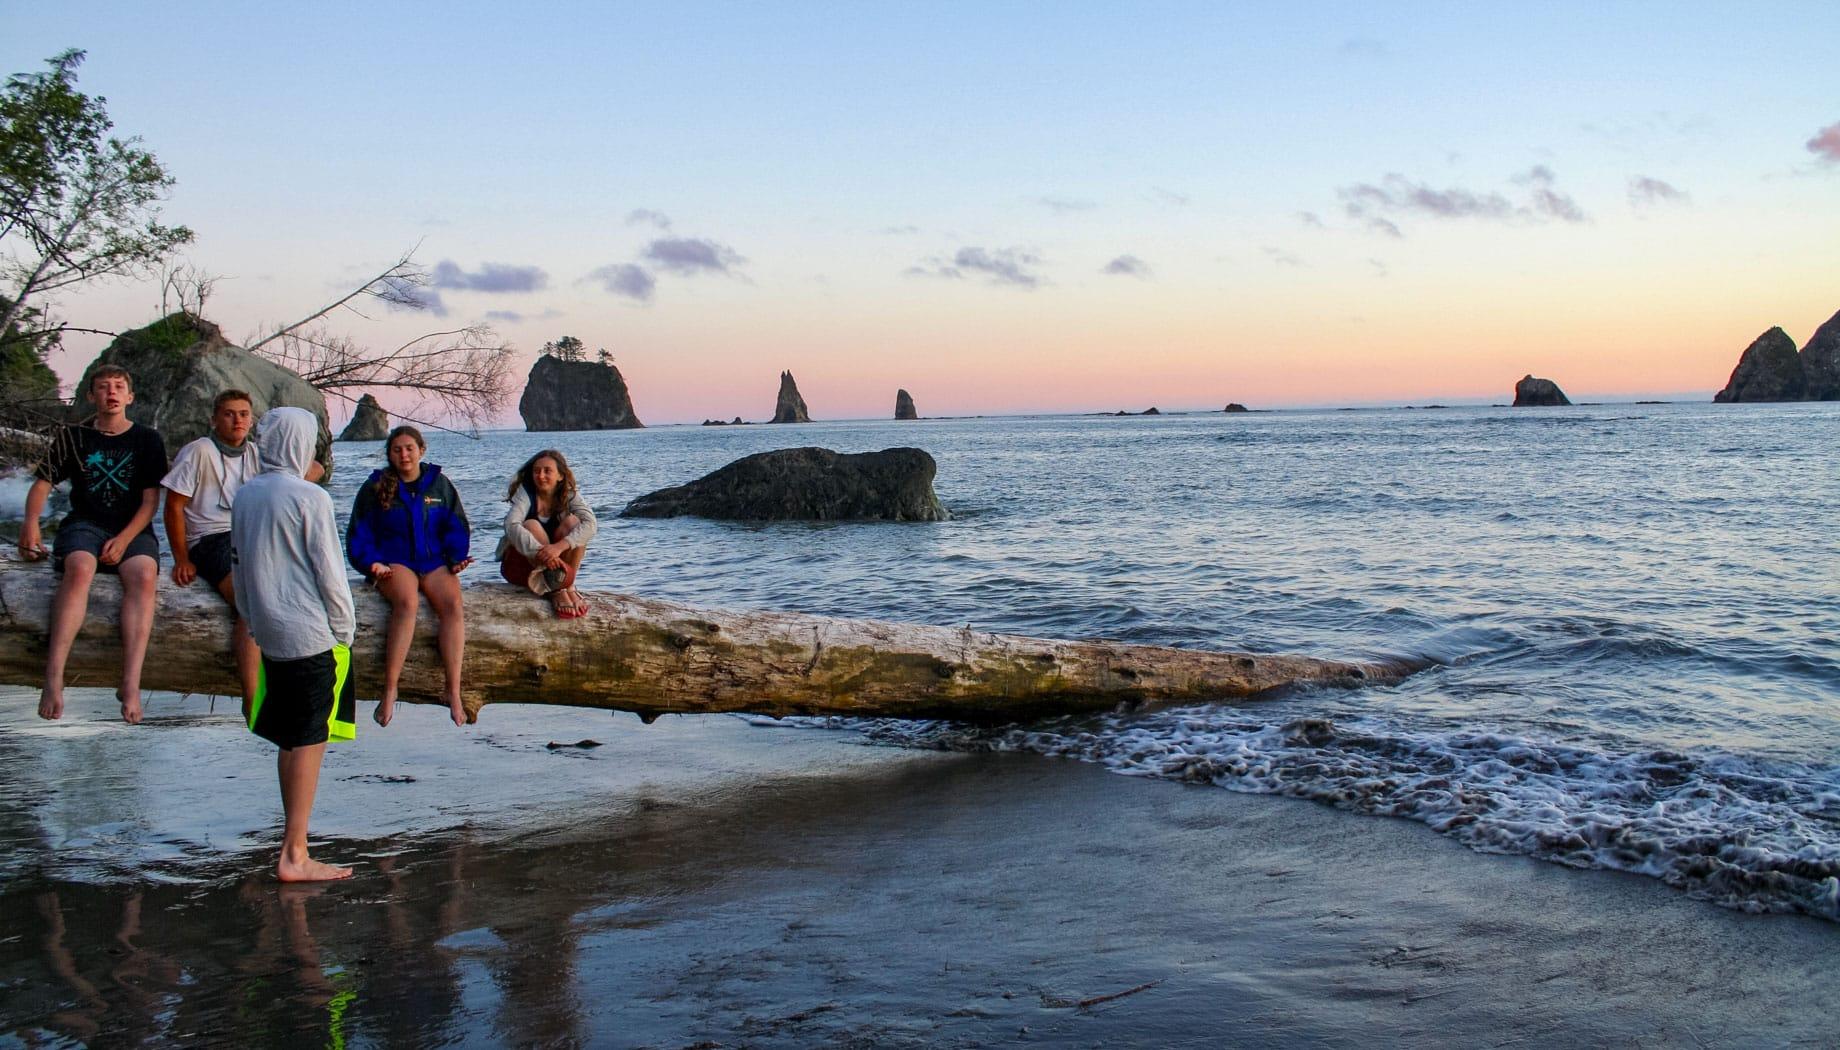 Admiring beach sunset on the Northwest Canada quest